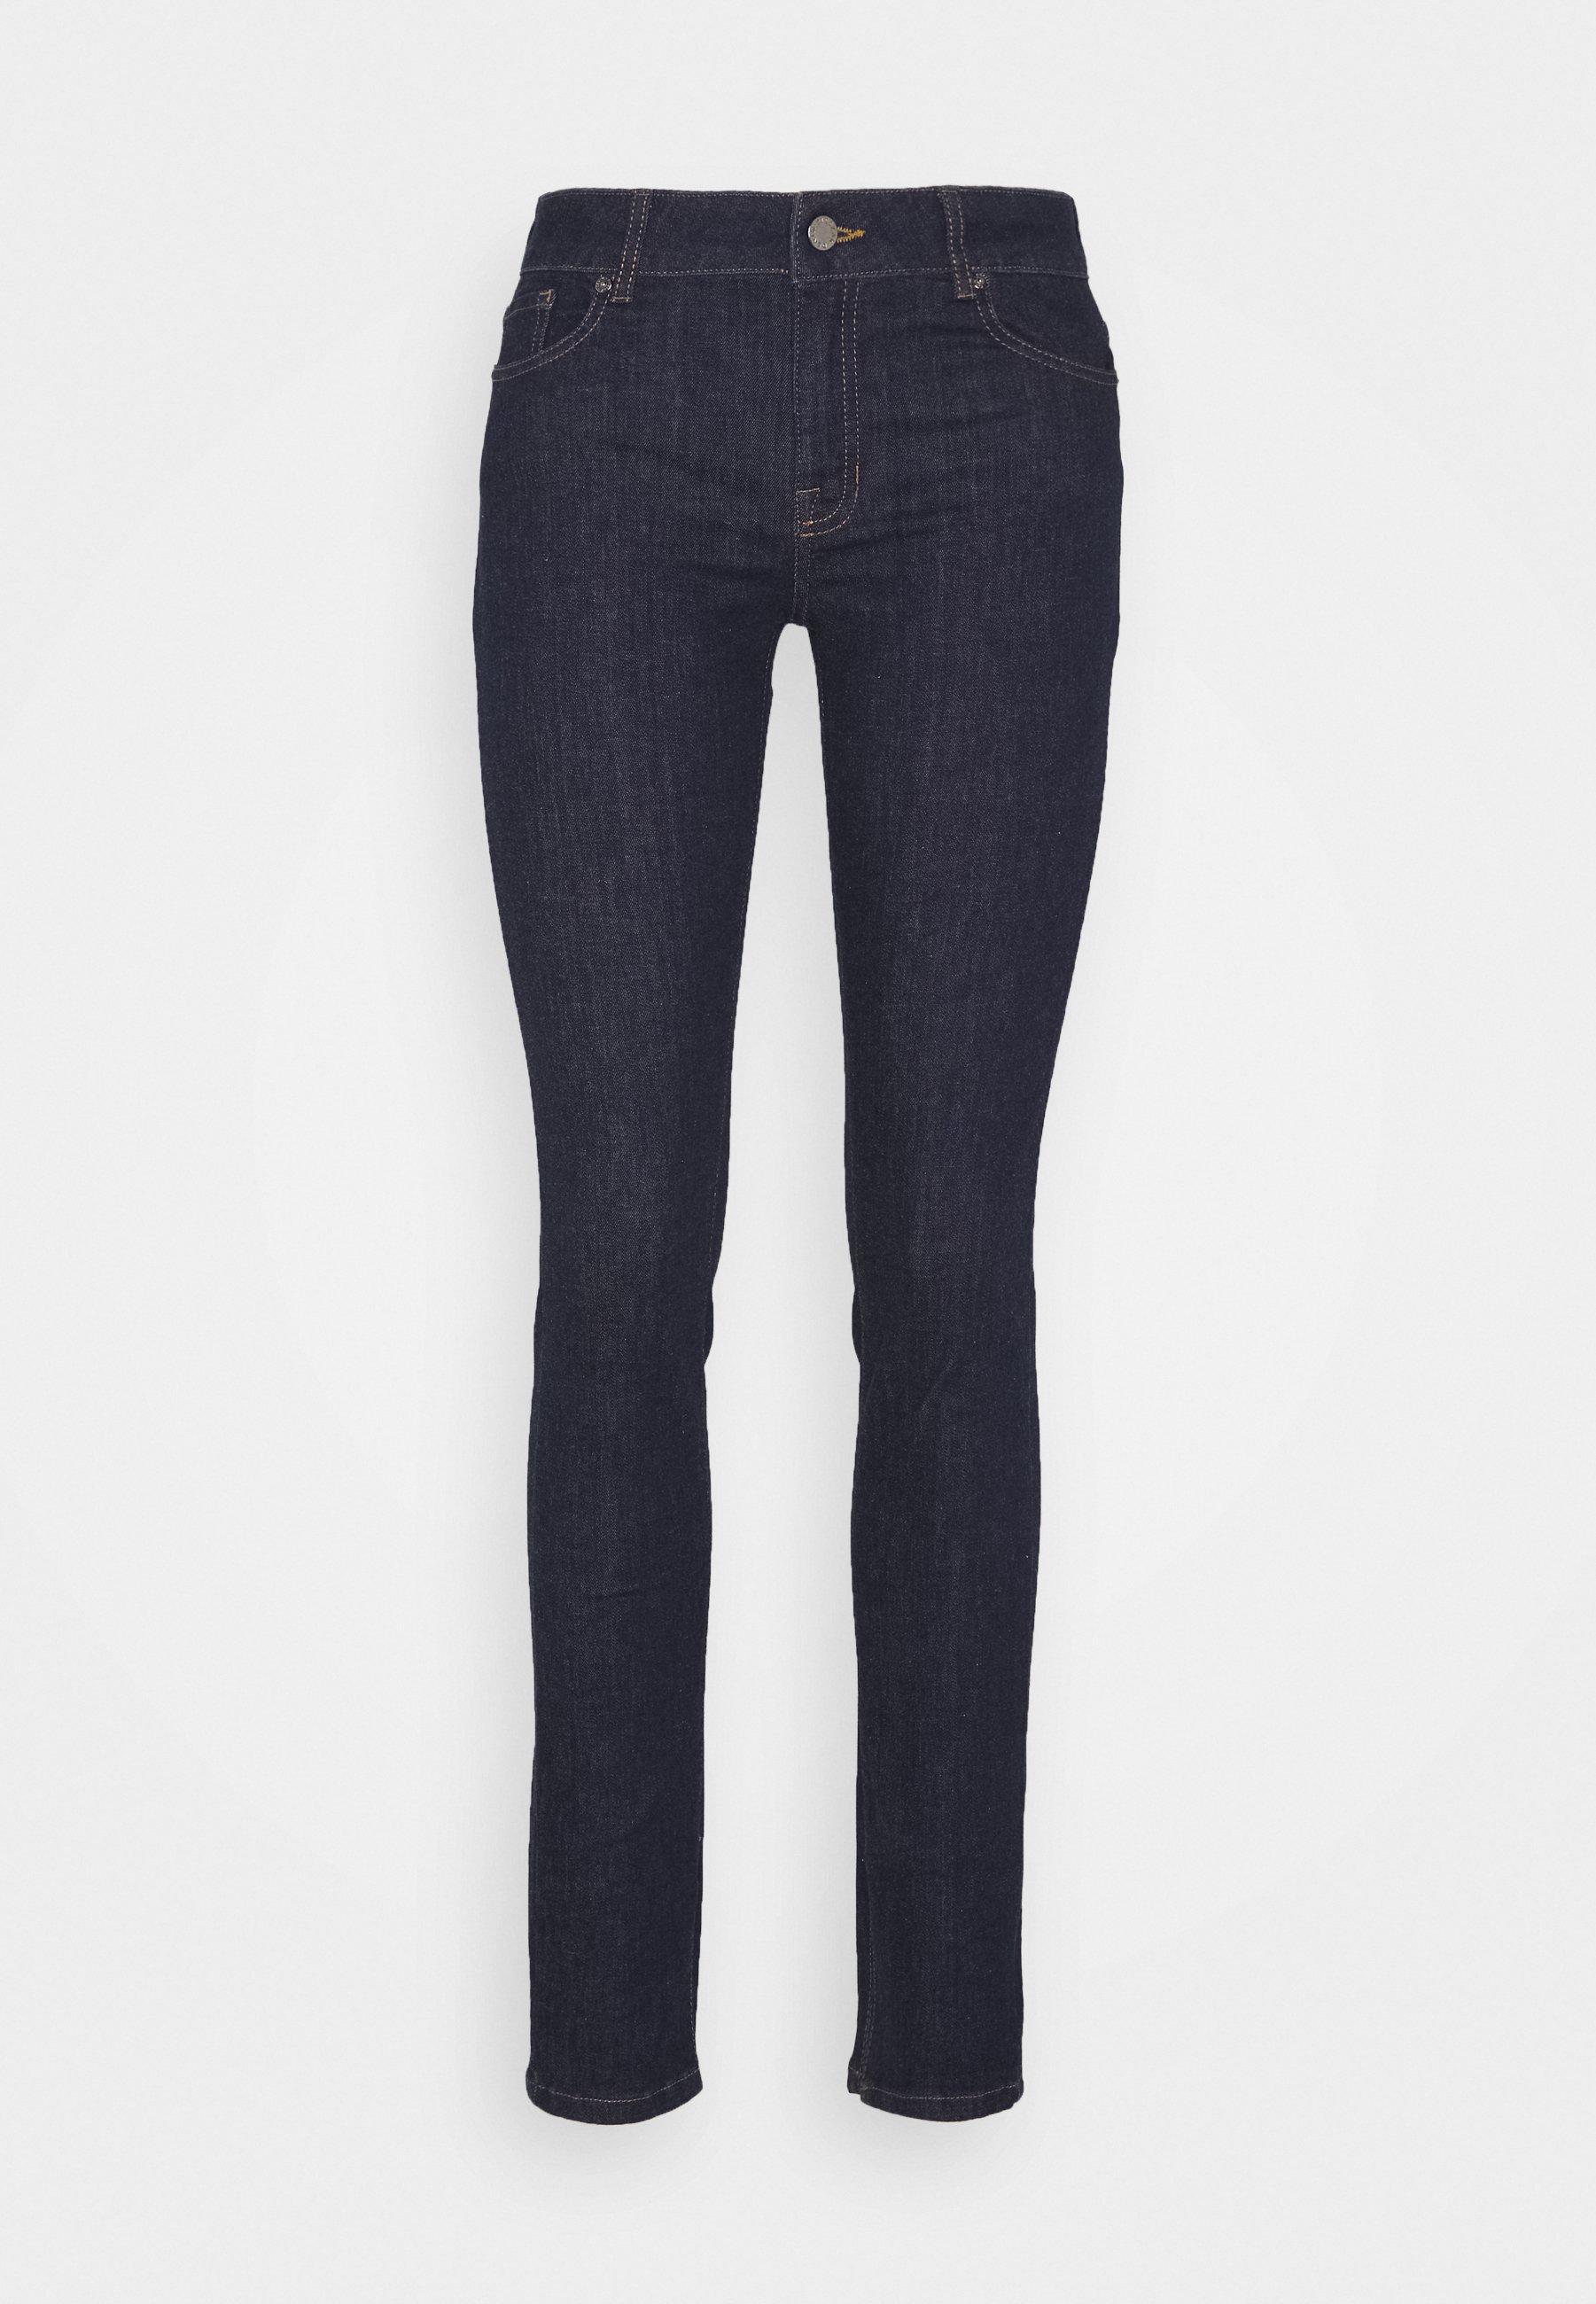 Pieszak Diva Split Clean Washington - Jeans Skinny Dark-blue Denim Ddx6GXx